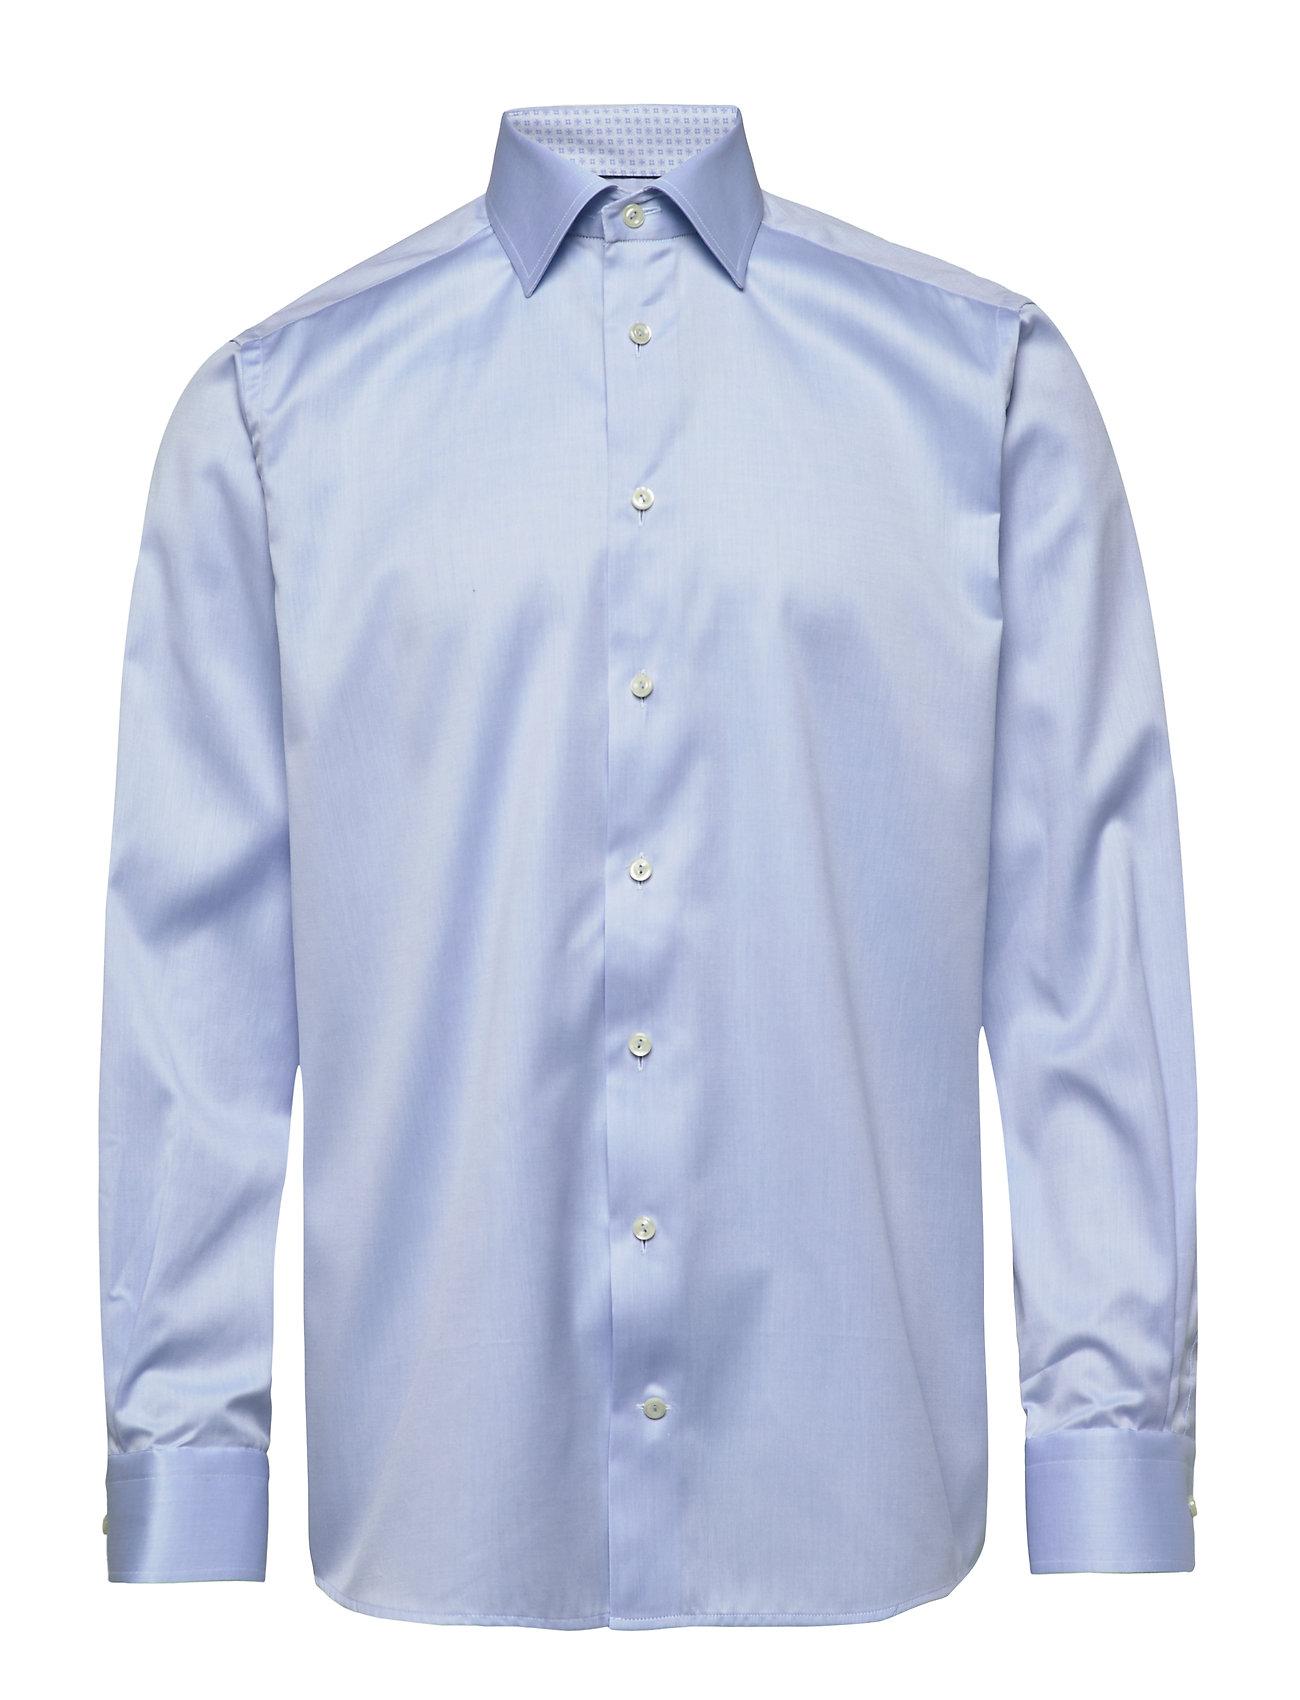 Eton Twill Shirt – Paisley Details - BLUE